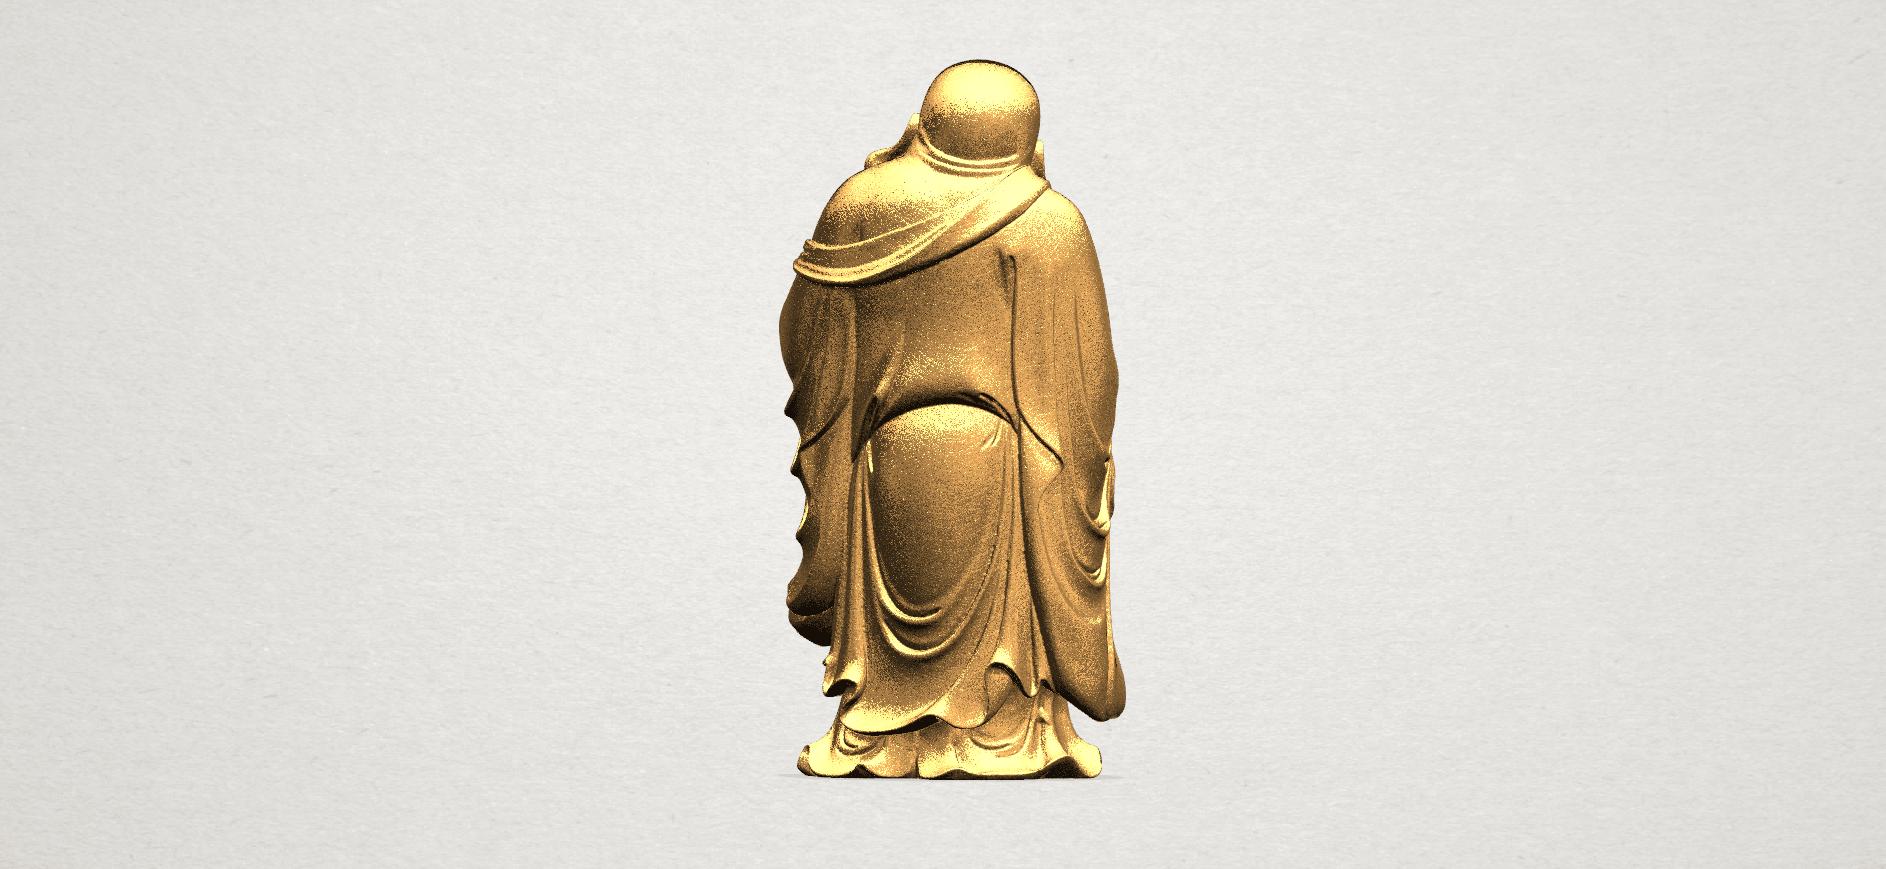 TDA0070 Metteyya Buddha 01 - 88mm - A04.png Download free STL file Metteyya Buddha 01 • 3D print object, GeorgesNikkei